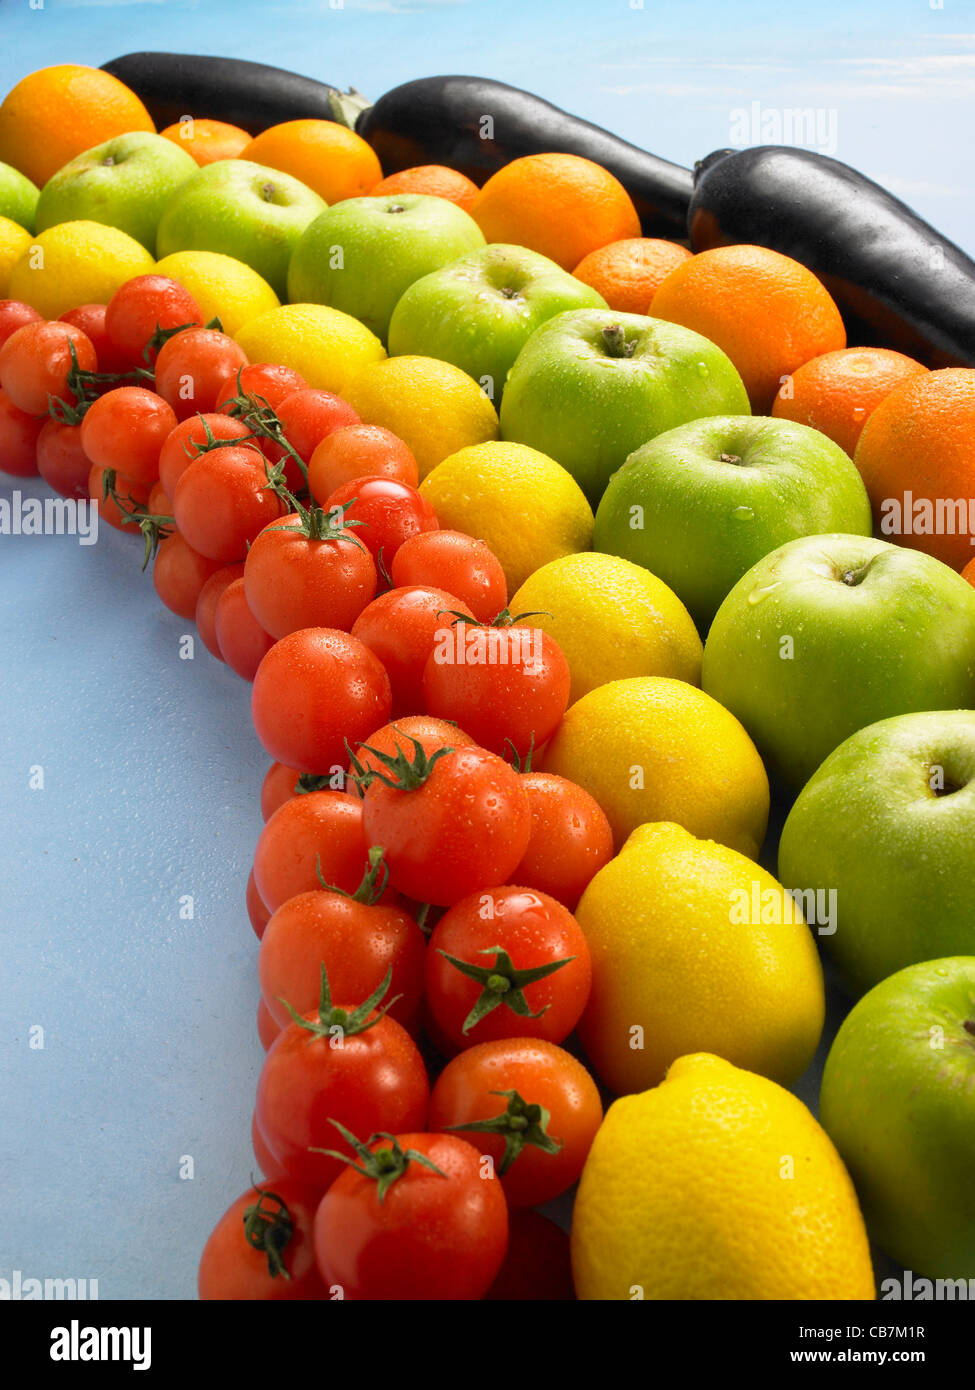 Tomatoes,lemons,green apples,Oranges, Aubergines, sprayed with water - Stock Image